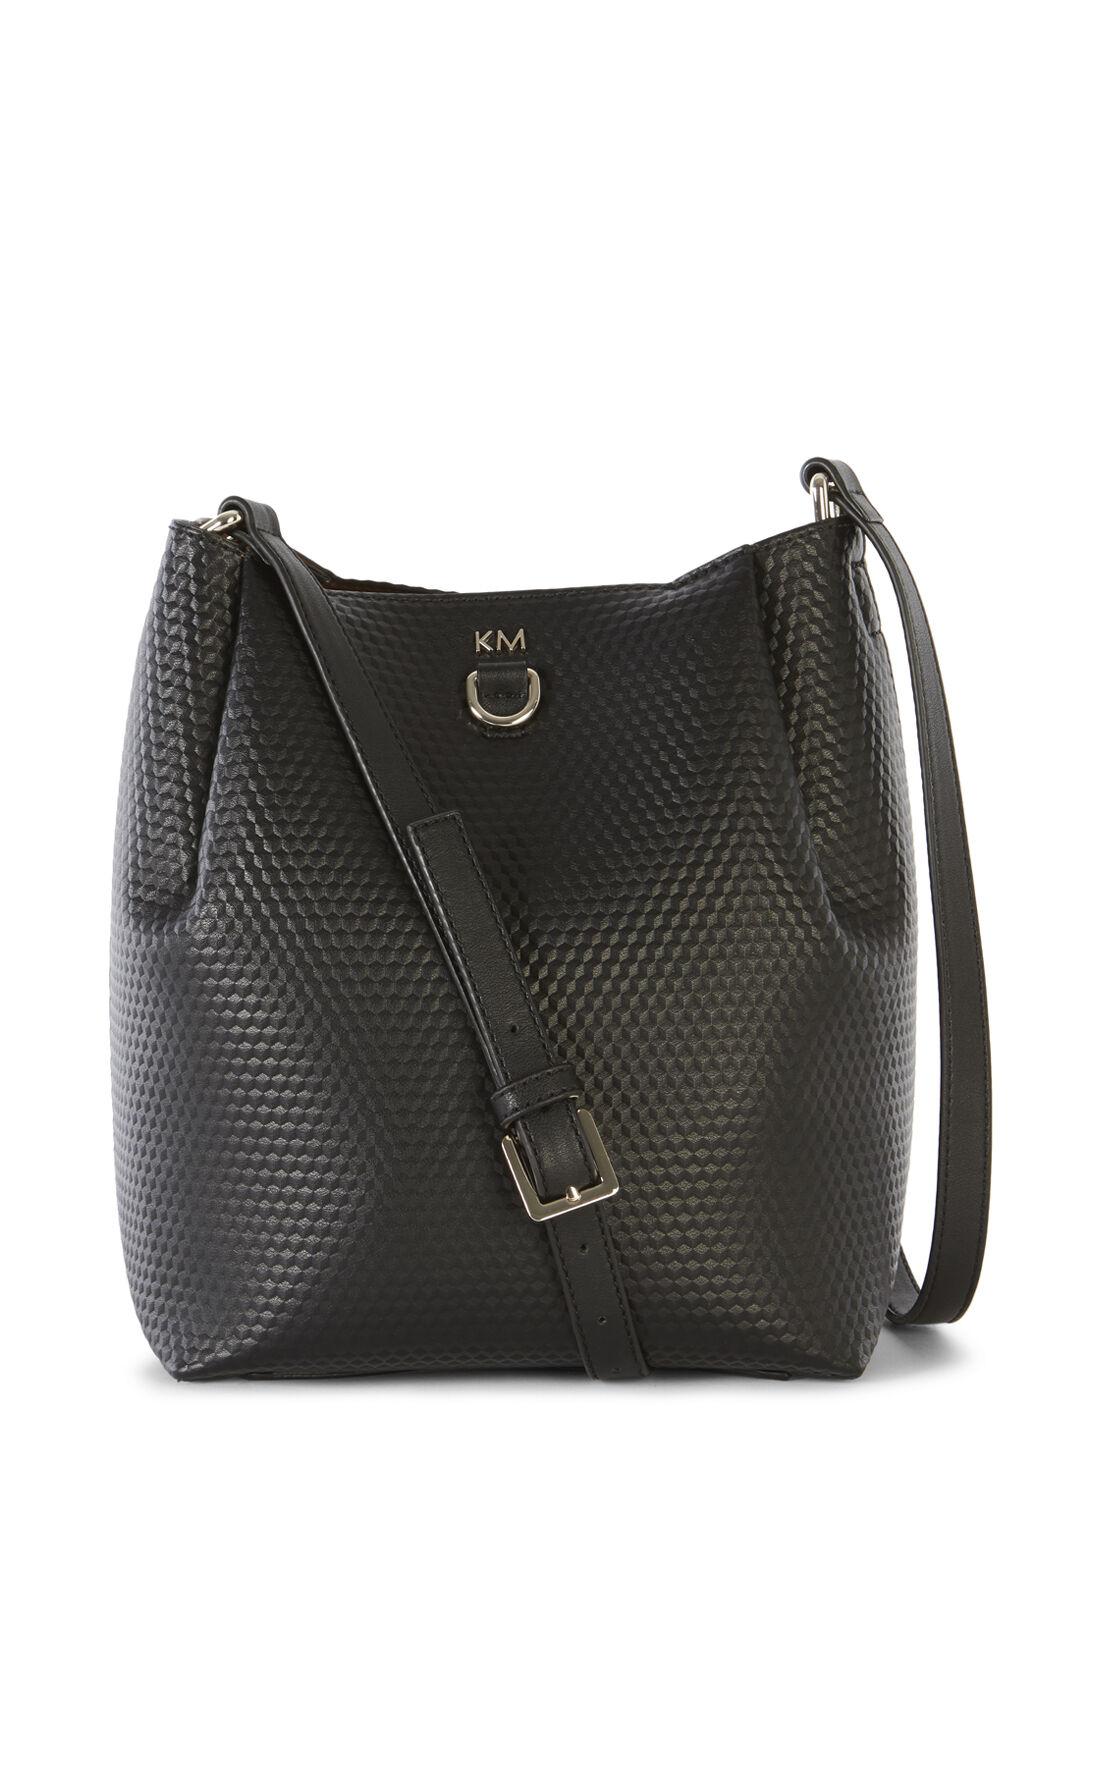 Karen Millen, EMBOSSED SHOULDER BAG Black 0